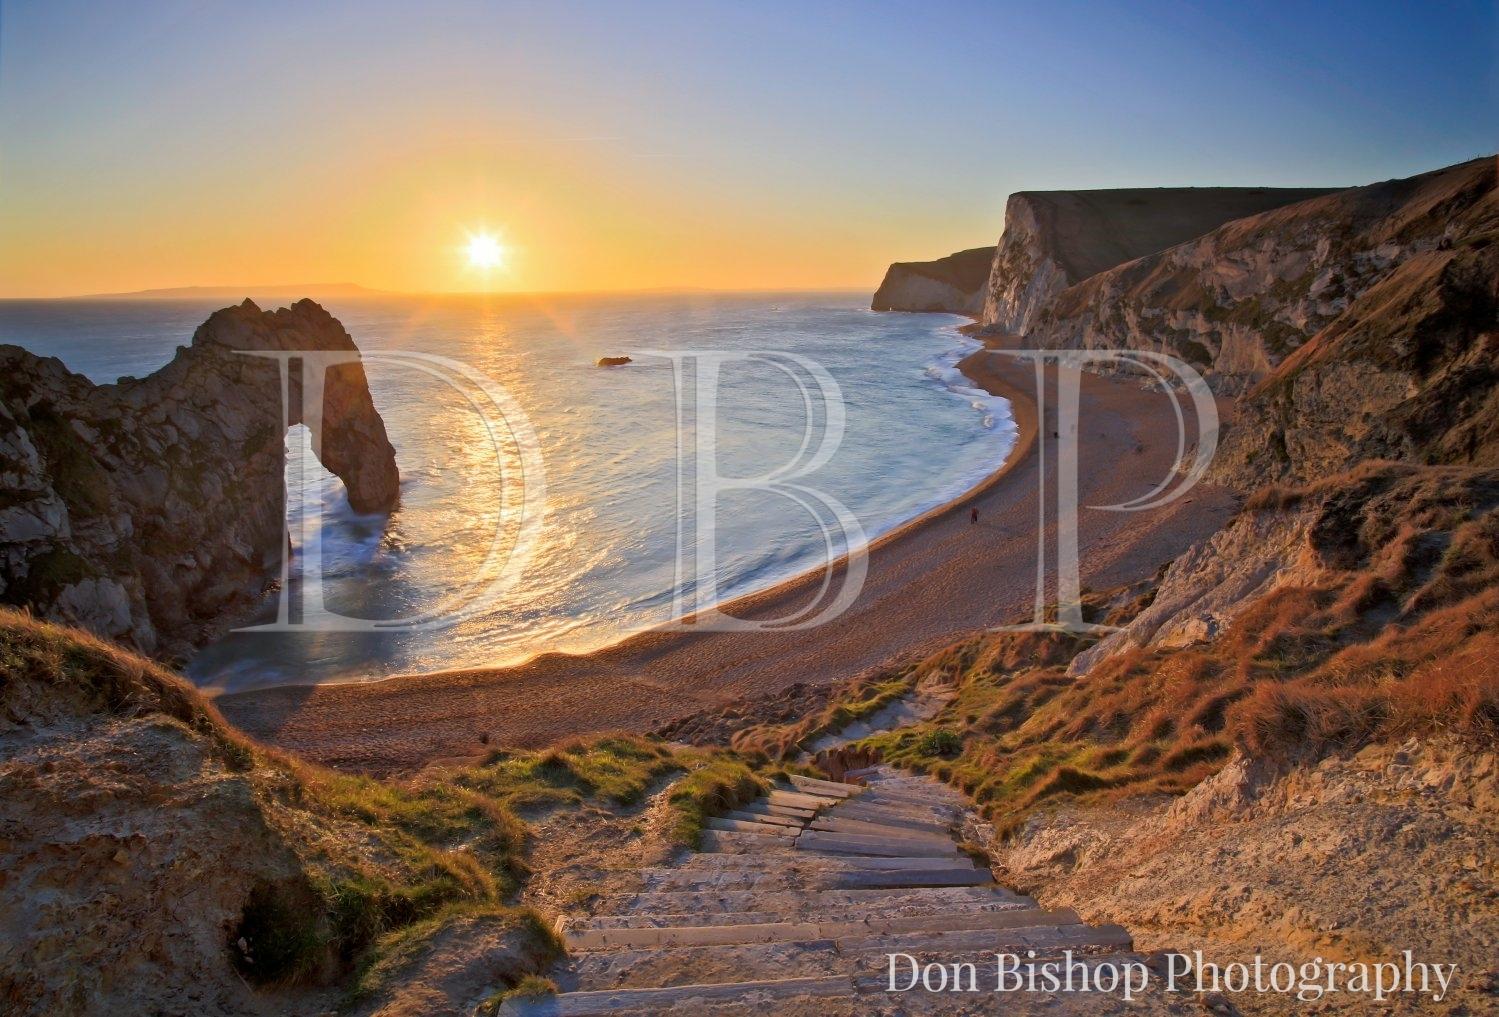 Durdle Door sunset & Durdle Door Sunset 1300 - Don Bishop Photography pezcame.com